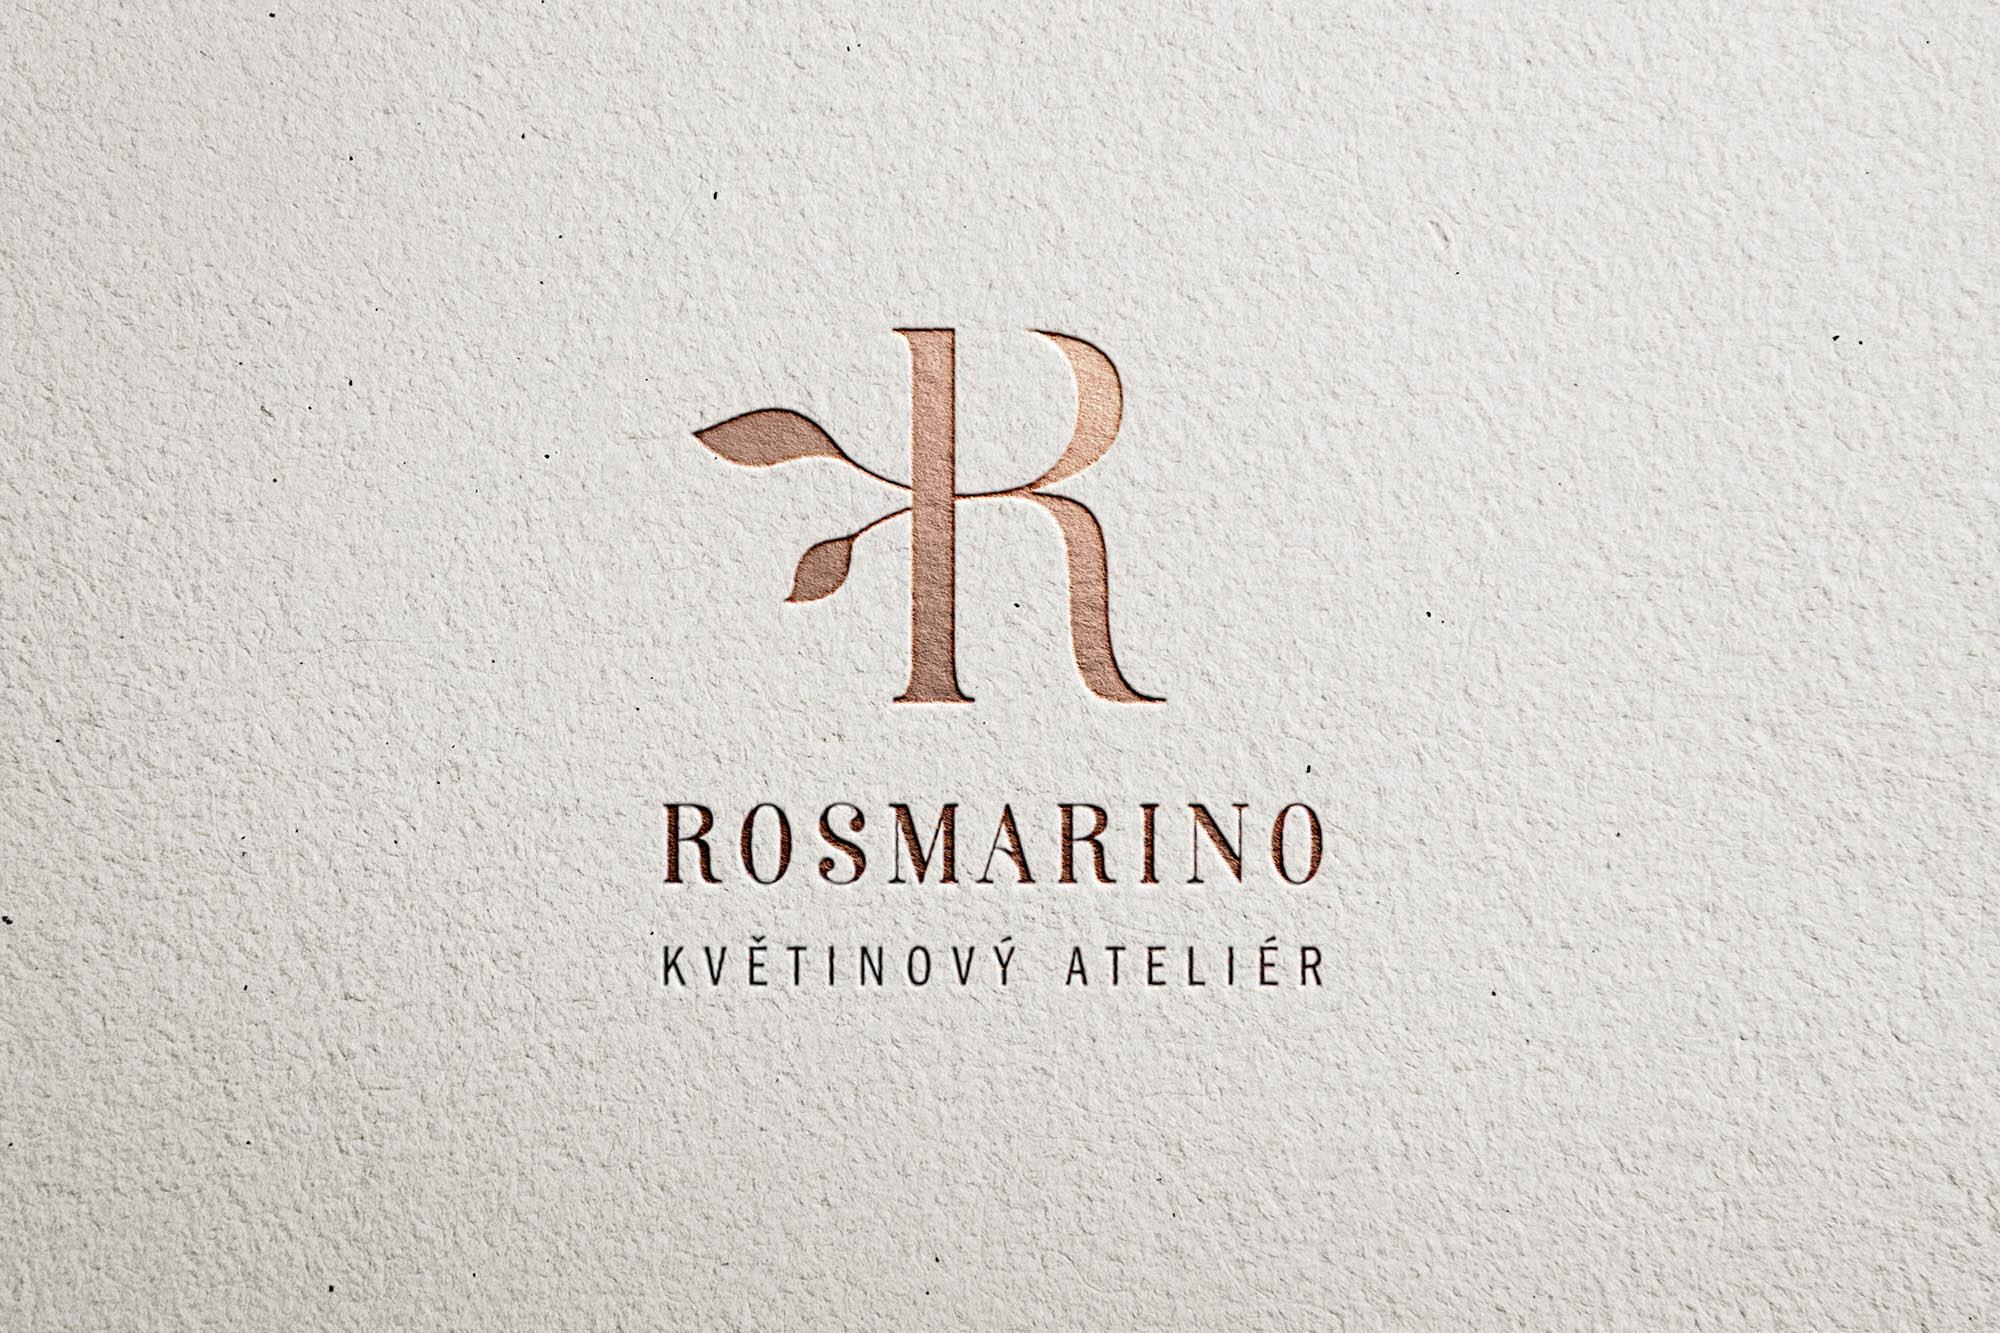 rosmarino-mockup_logo1